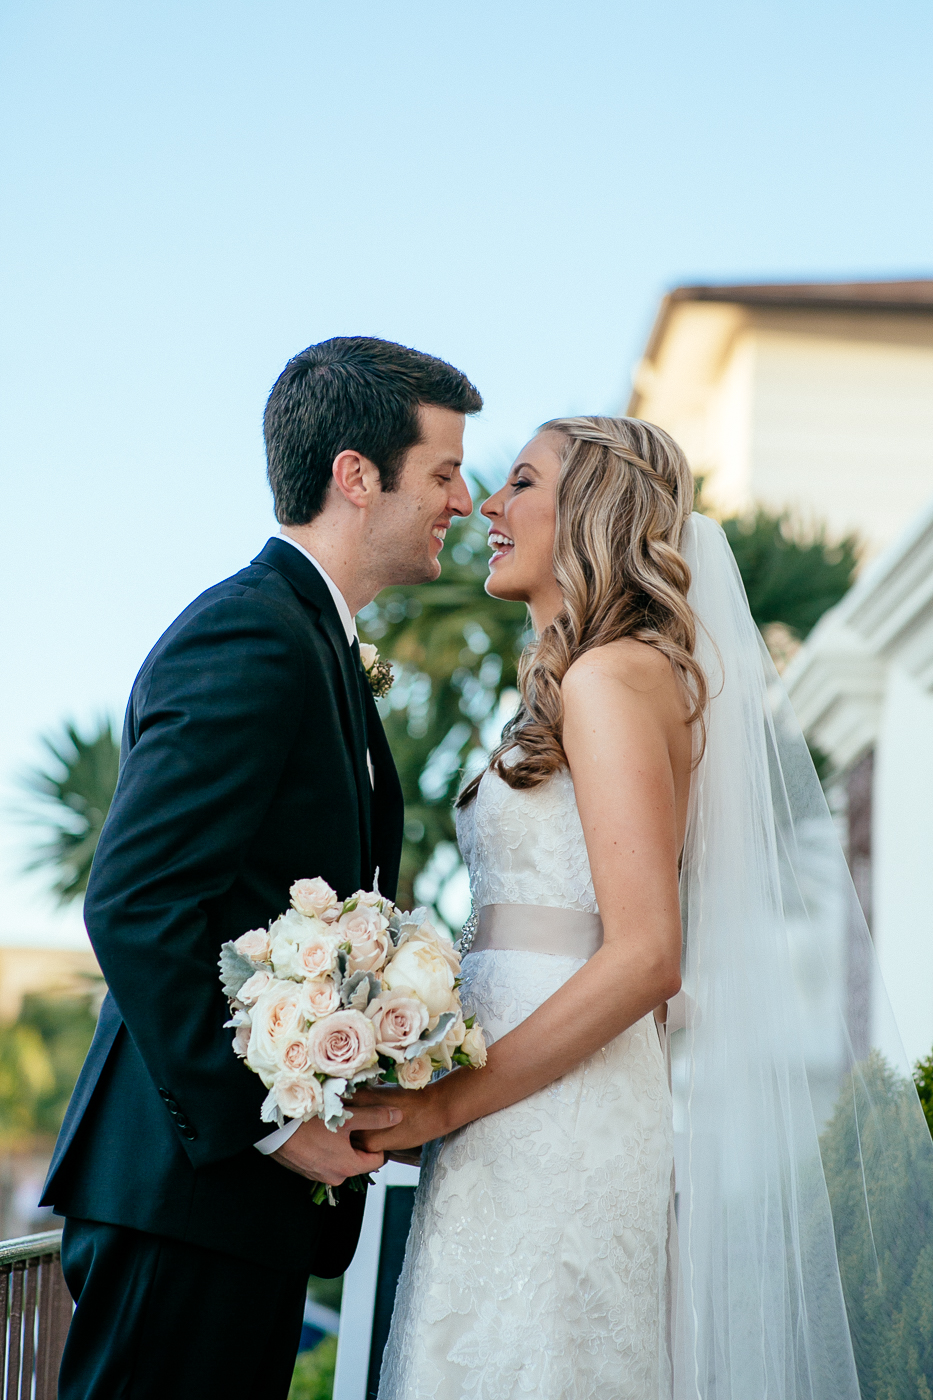 RYAN_&_KELLEY_DARLINGTON_HOUSE_WEDDING_2014_7X9A2417.JPG